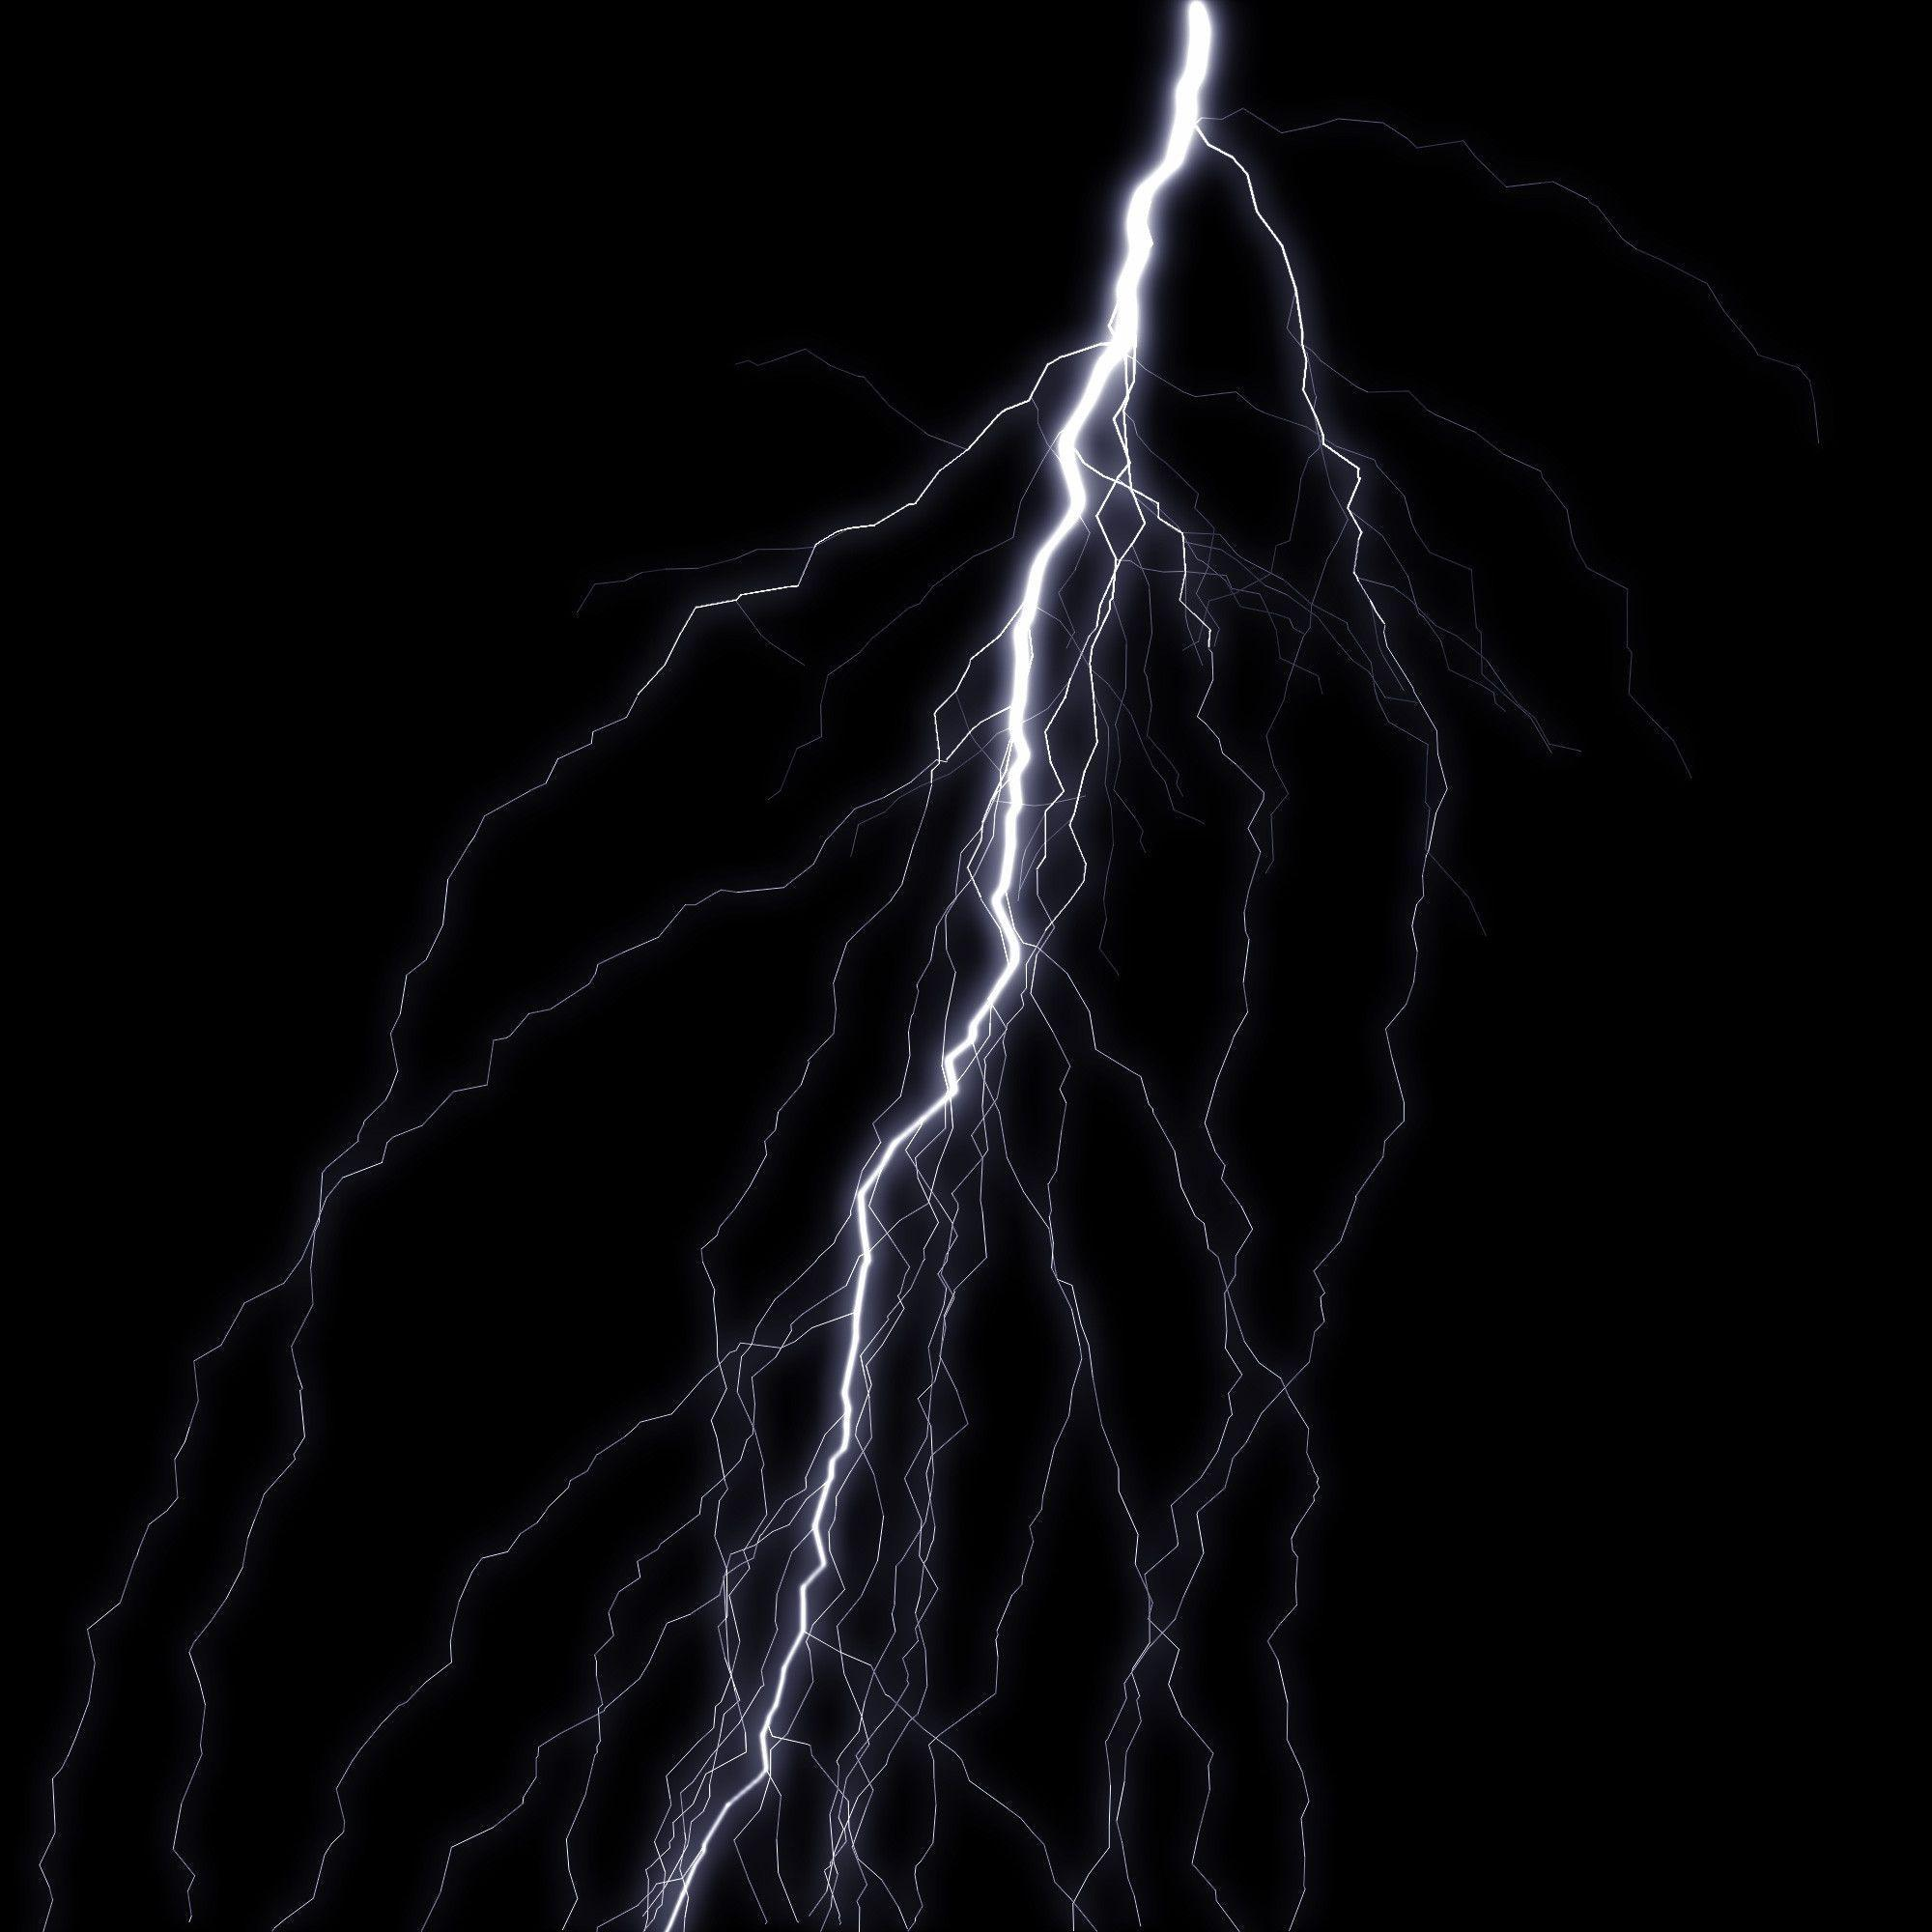 Lightning Bolt Backgrounds